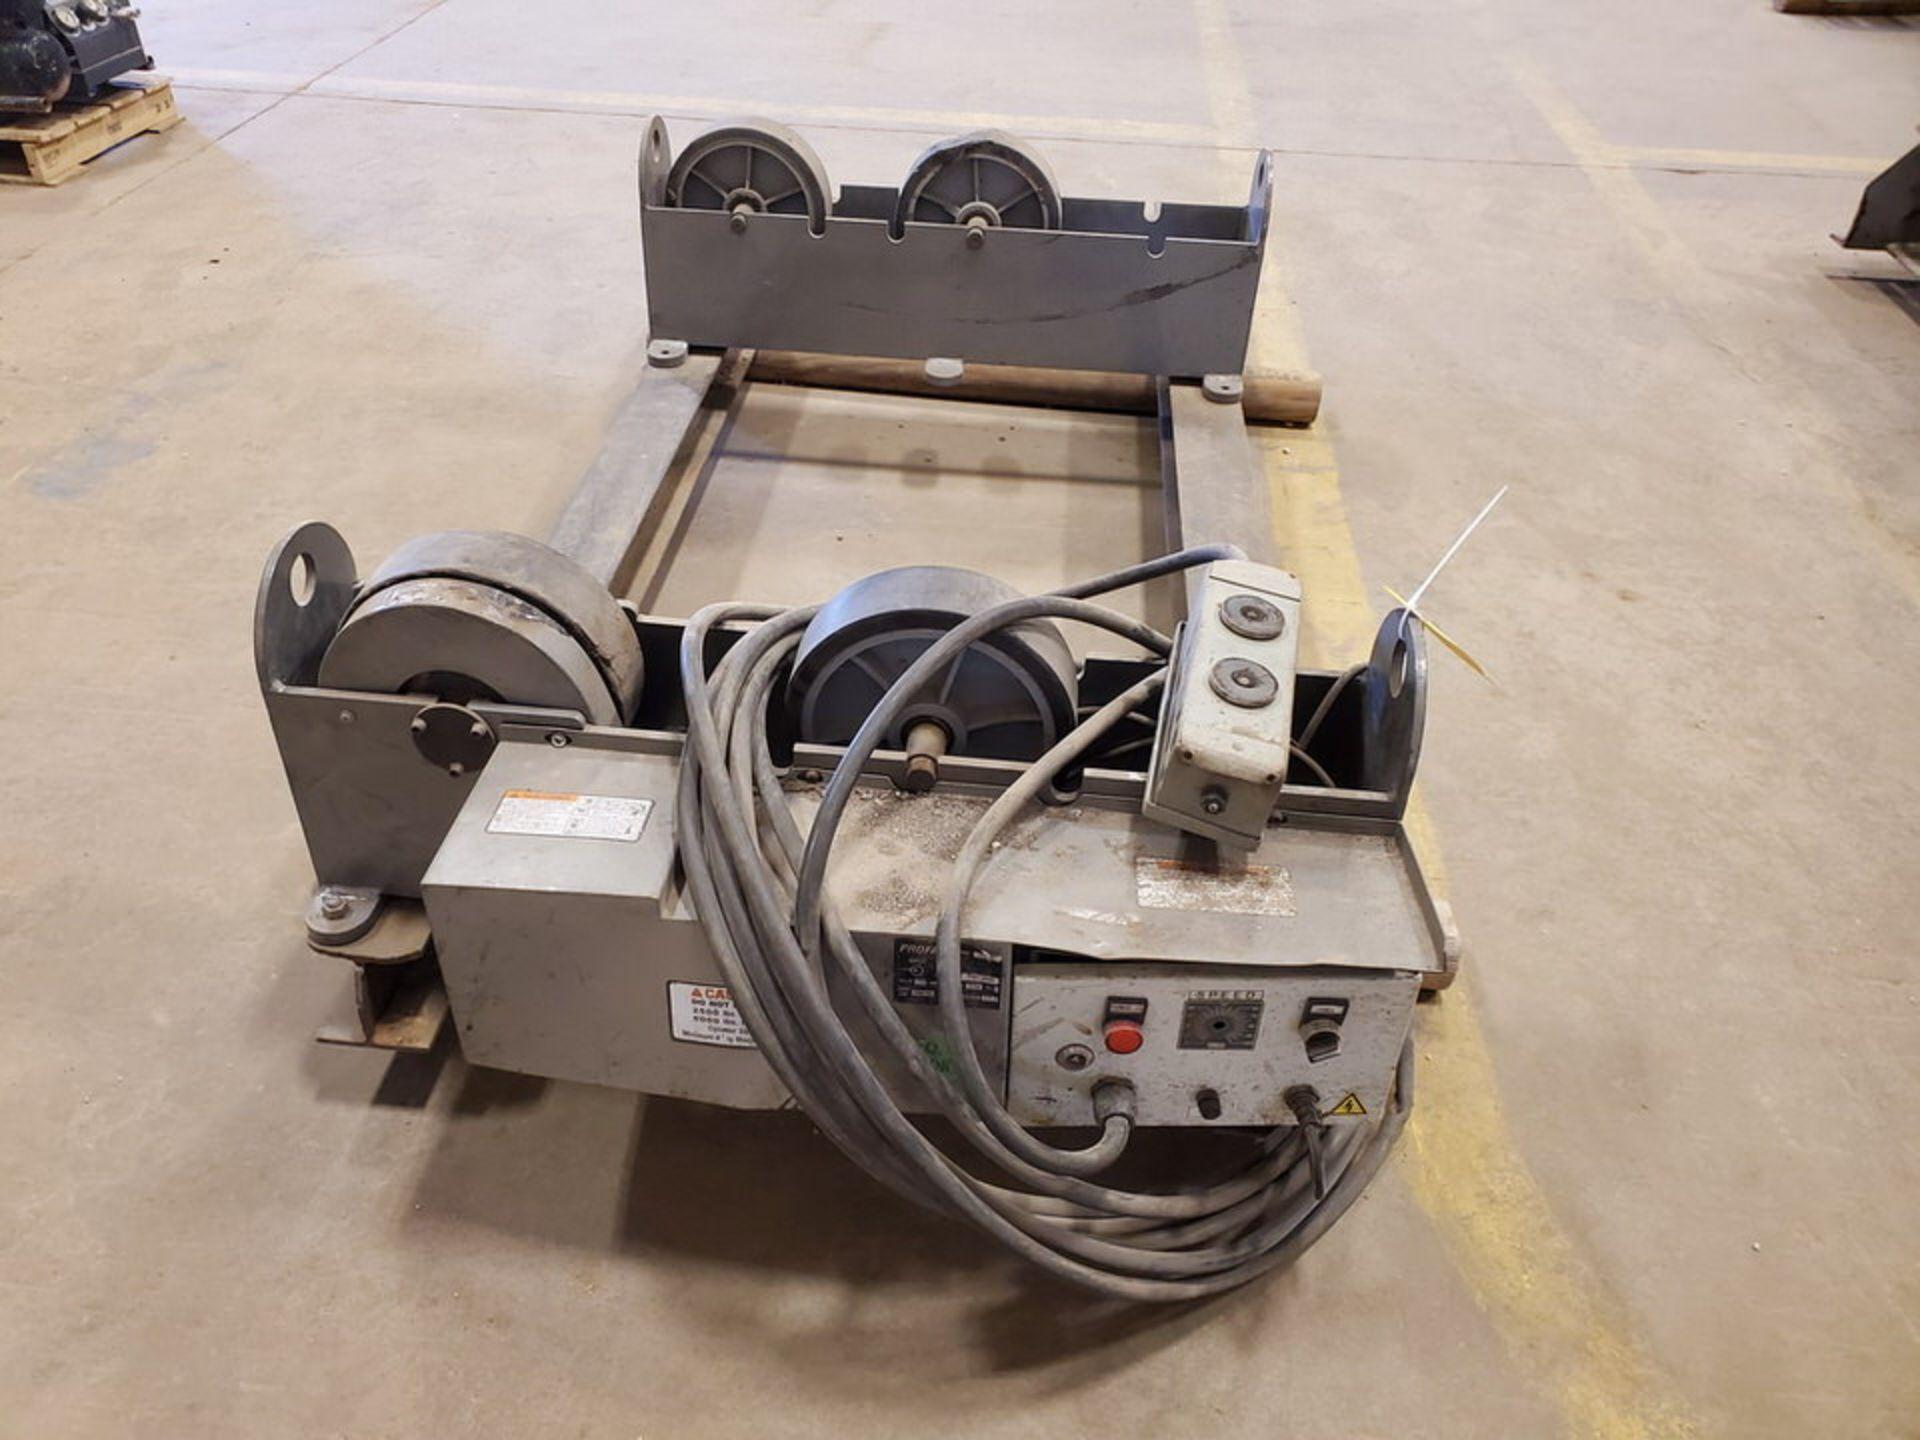 "Profax TR-5000 Turn Roll 2500 Cap., 115V, 10A, 50/60HZ, 1PH, RPM: 0.5-5; 3"" Wheel Dia.; Skid Dims: - Image 2 of 9"